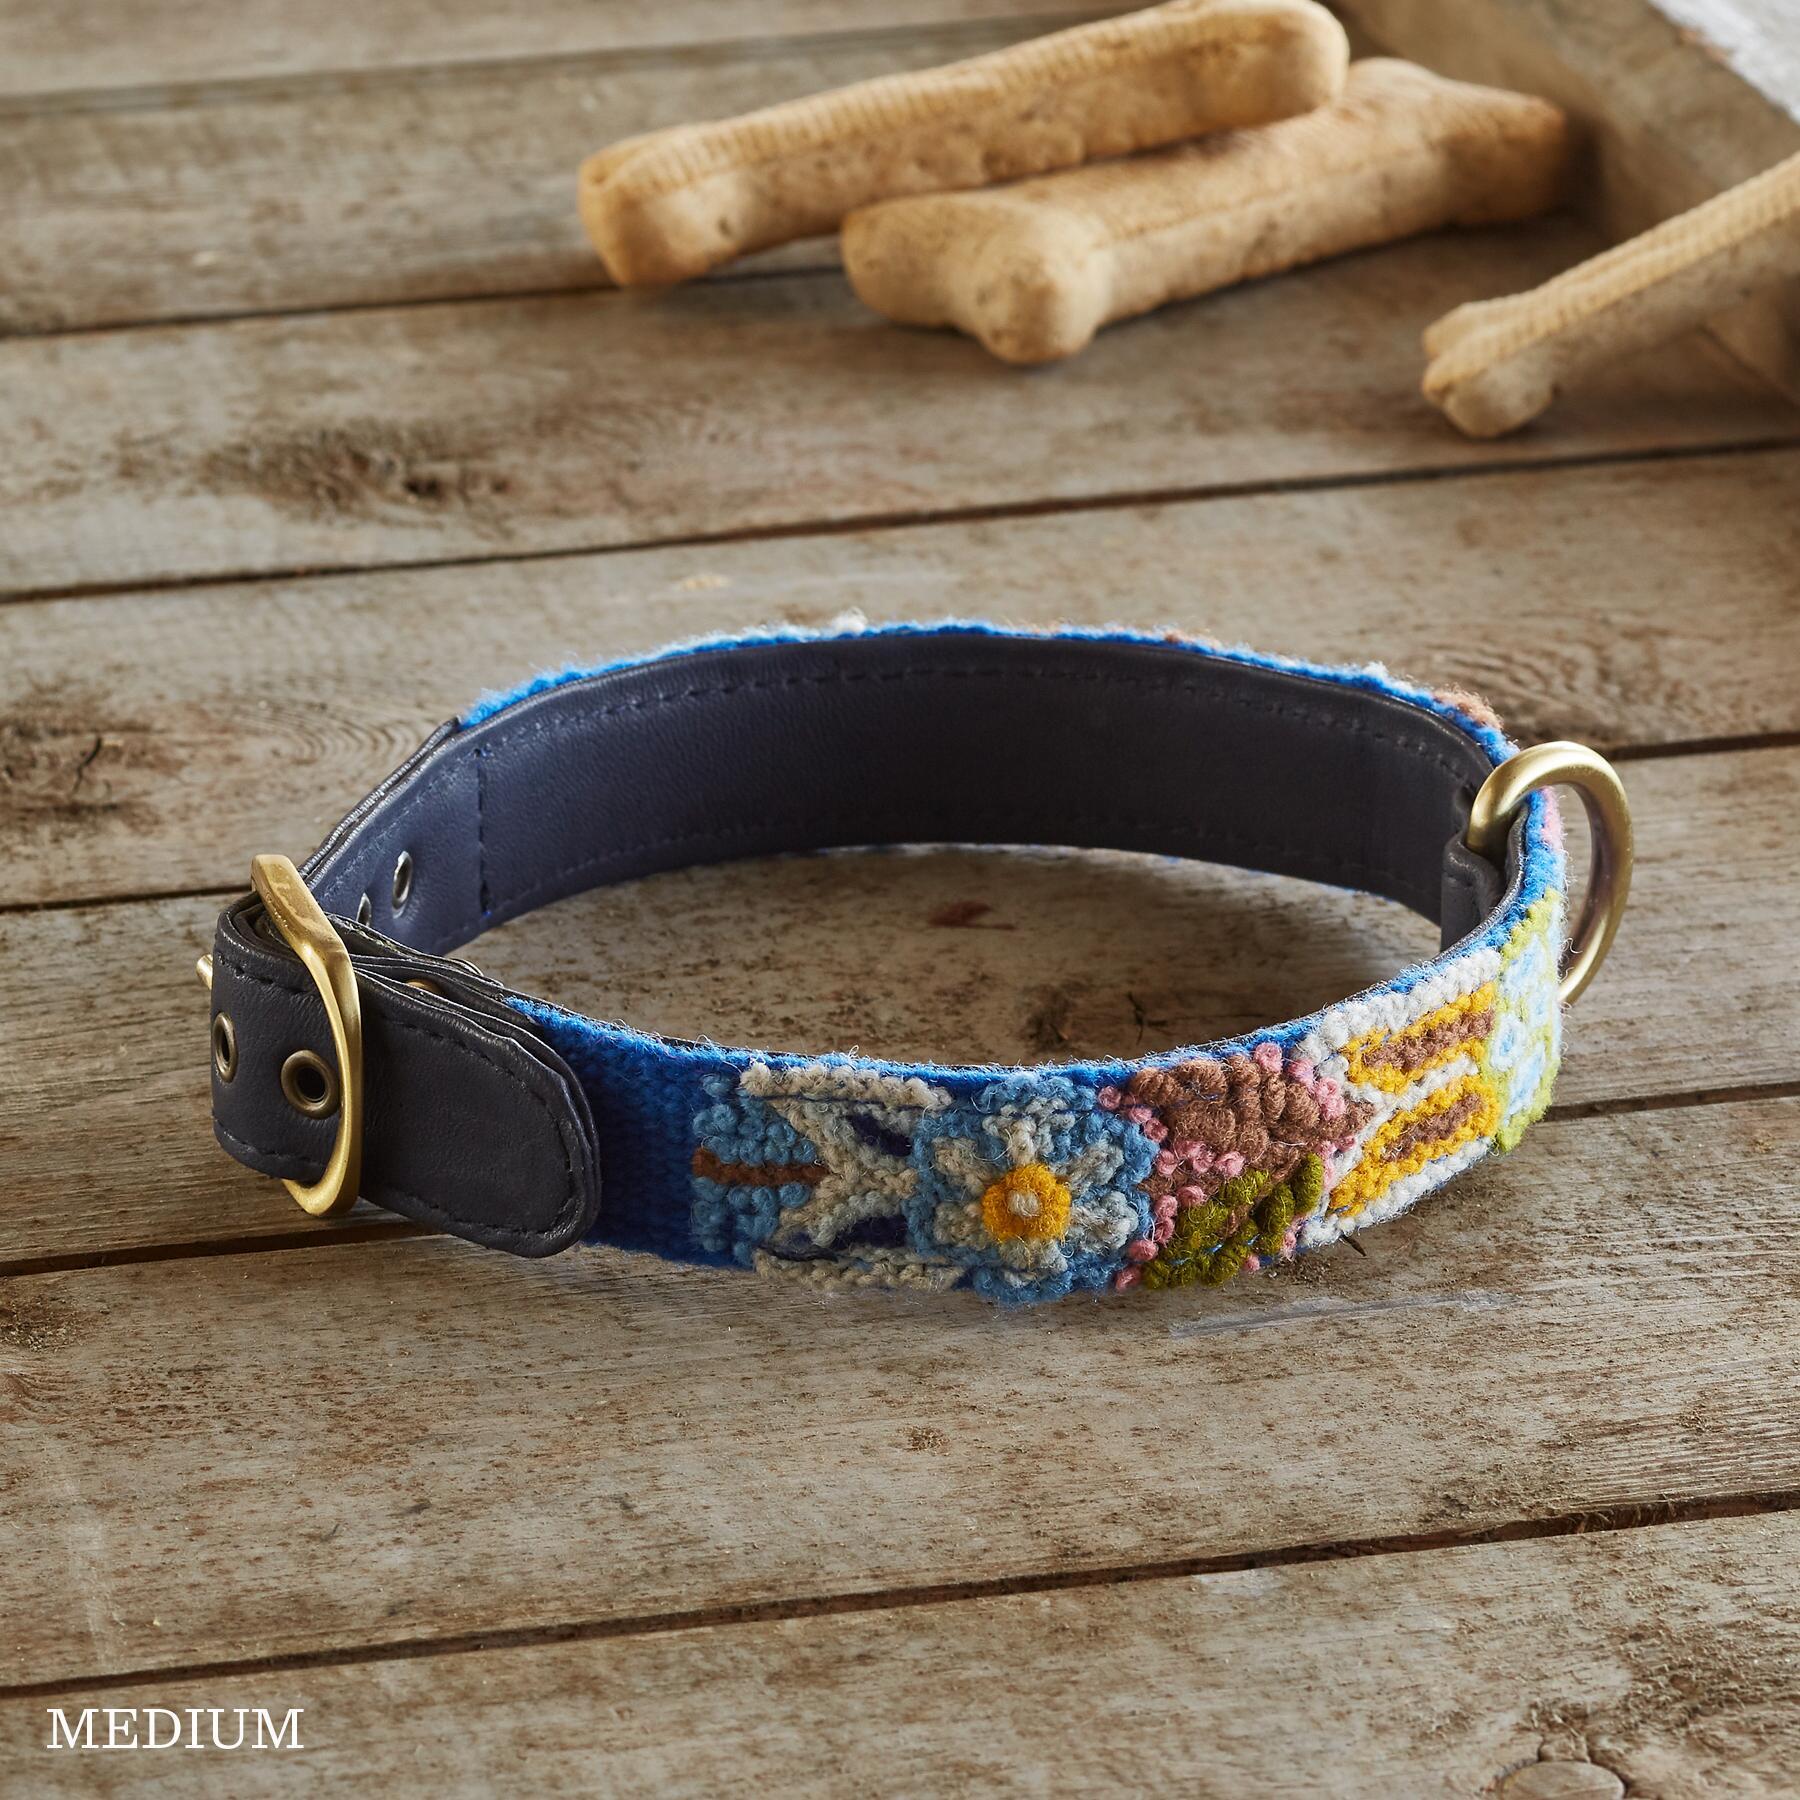 HANDMADE DOG COLLAR - FOLKLORIC: View 2